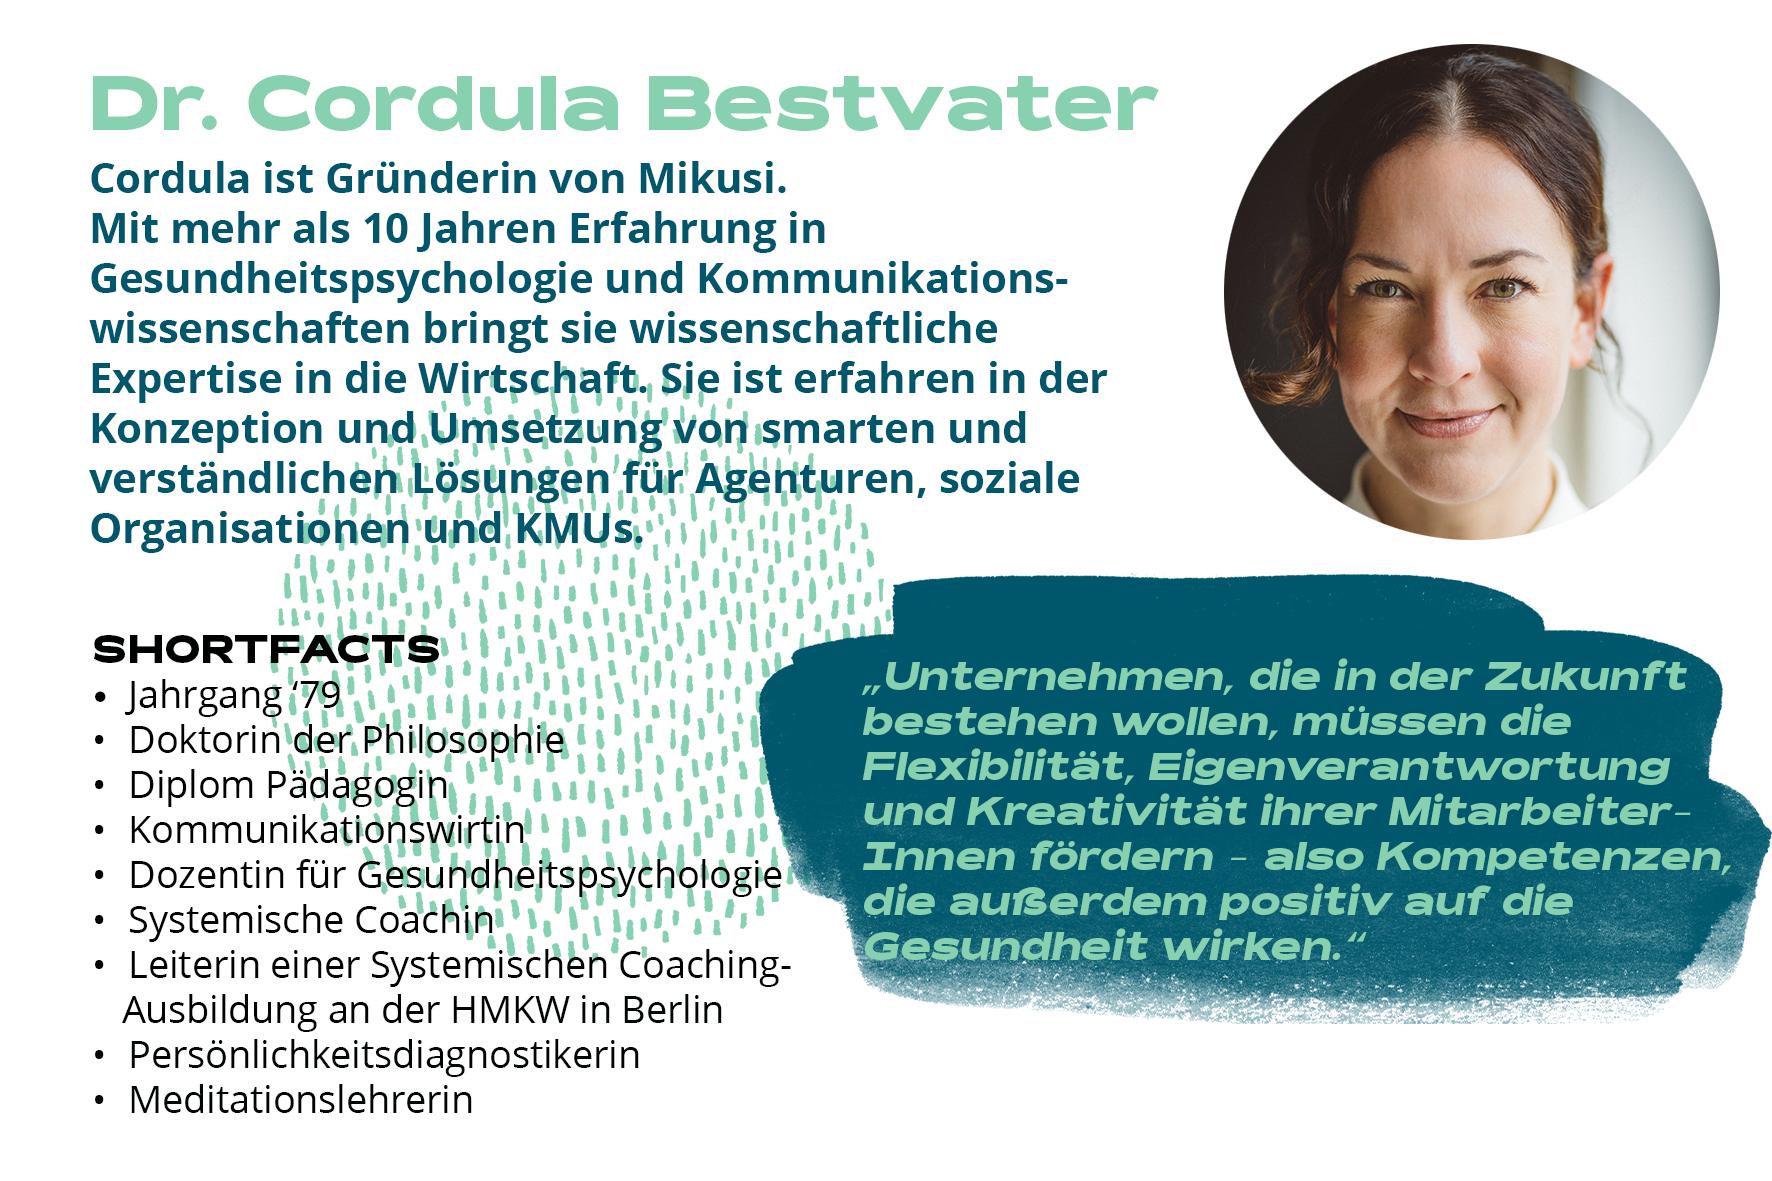 Dr. Cordula Bestvater